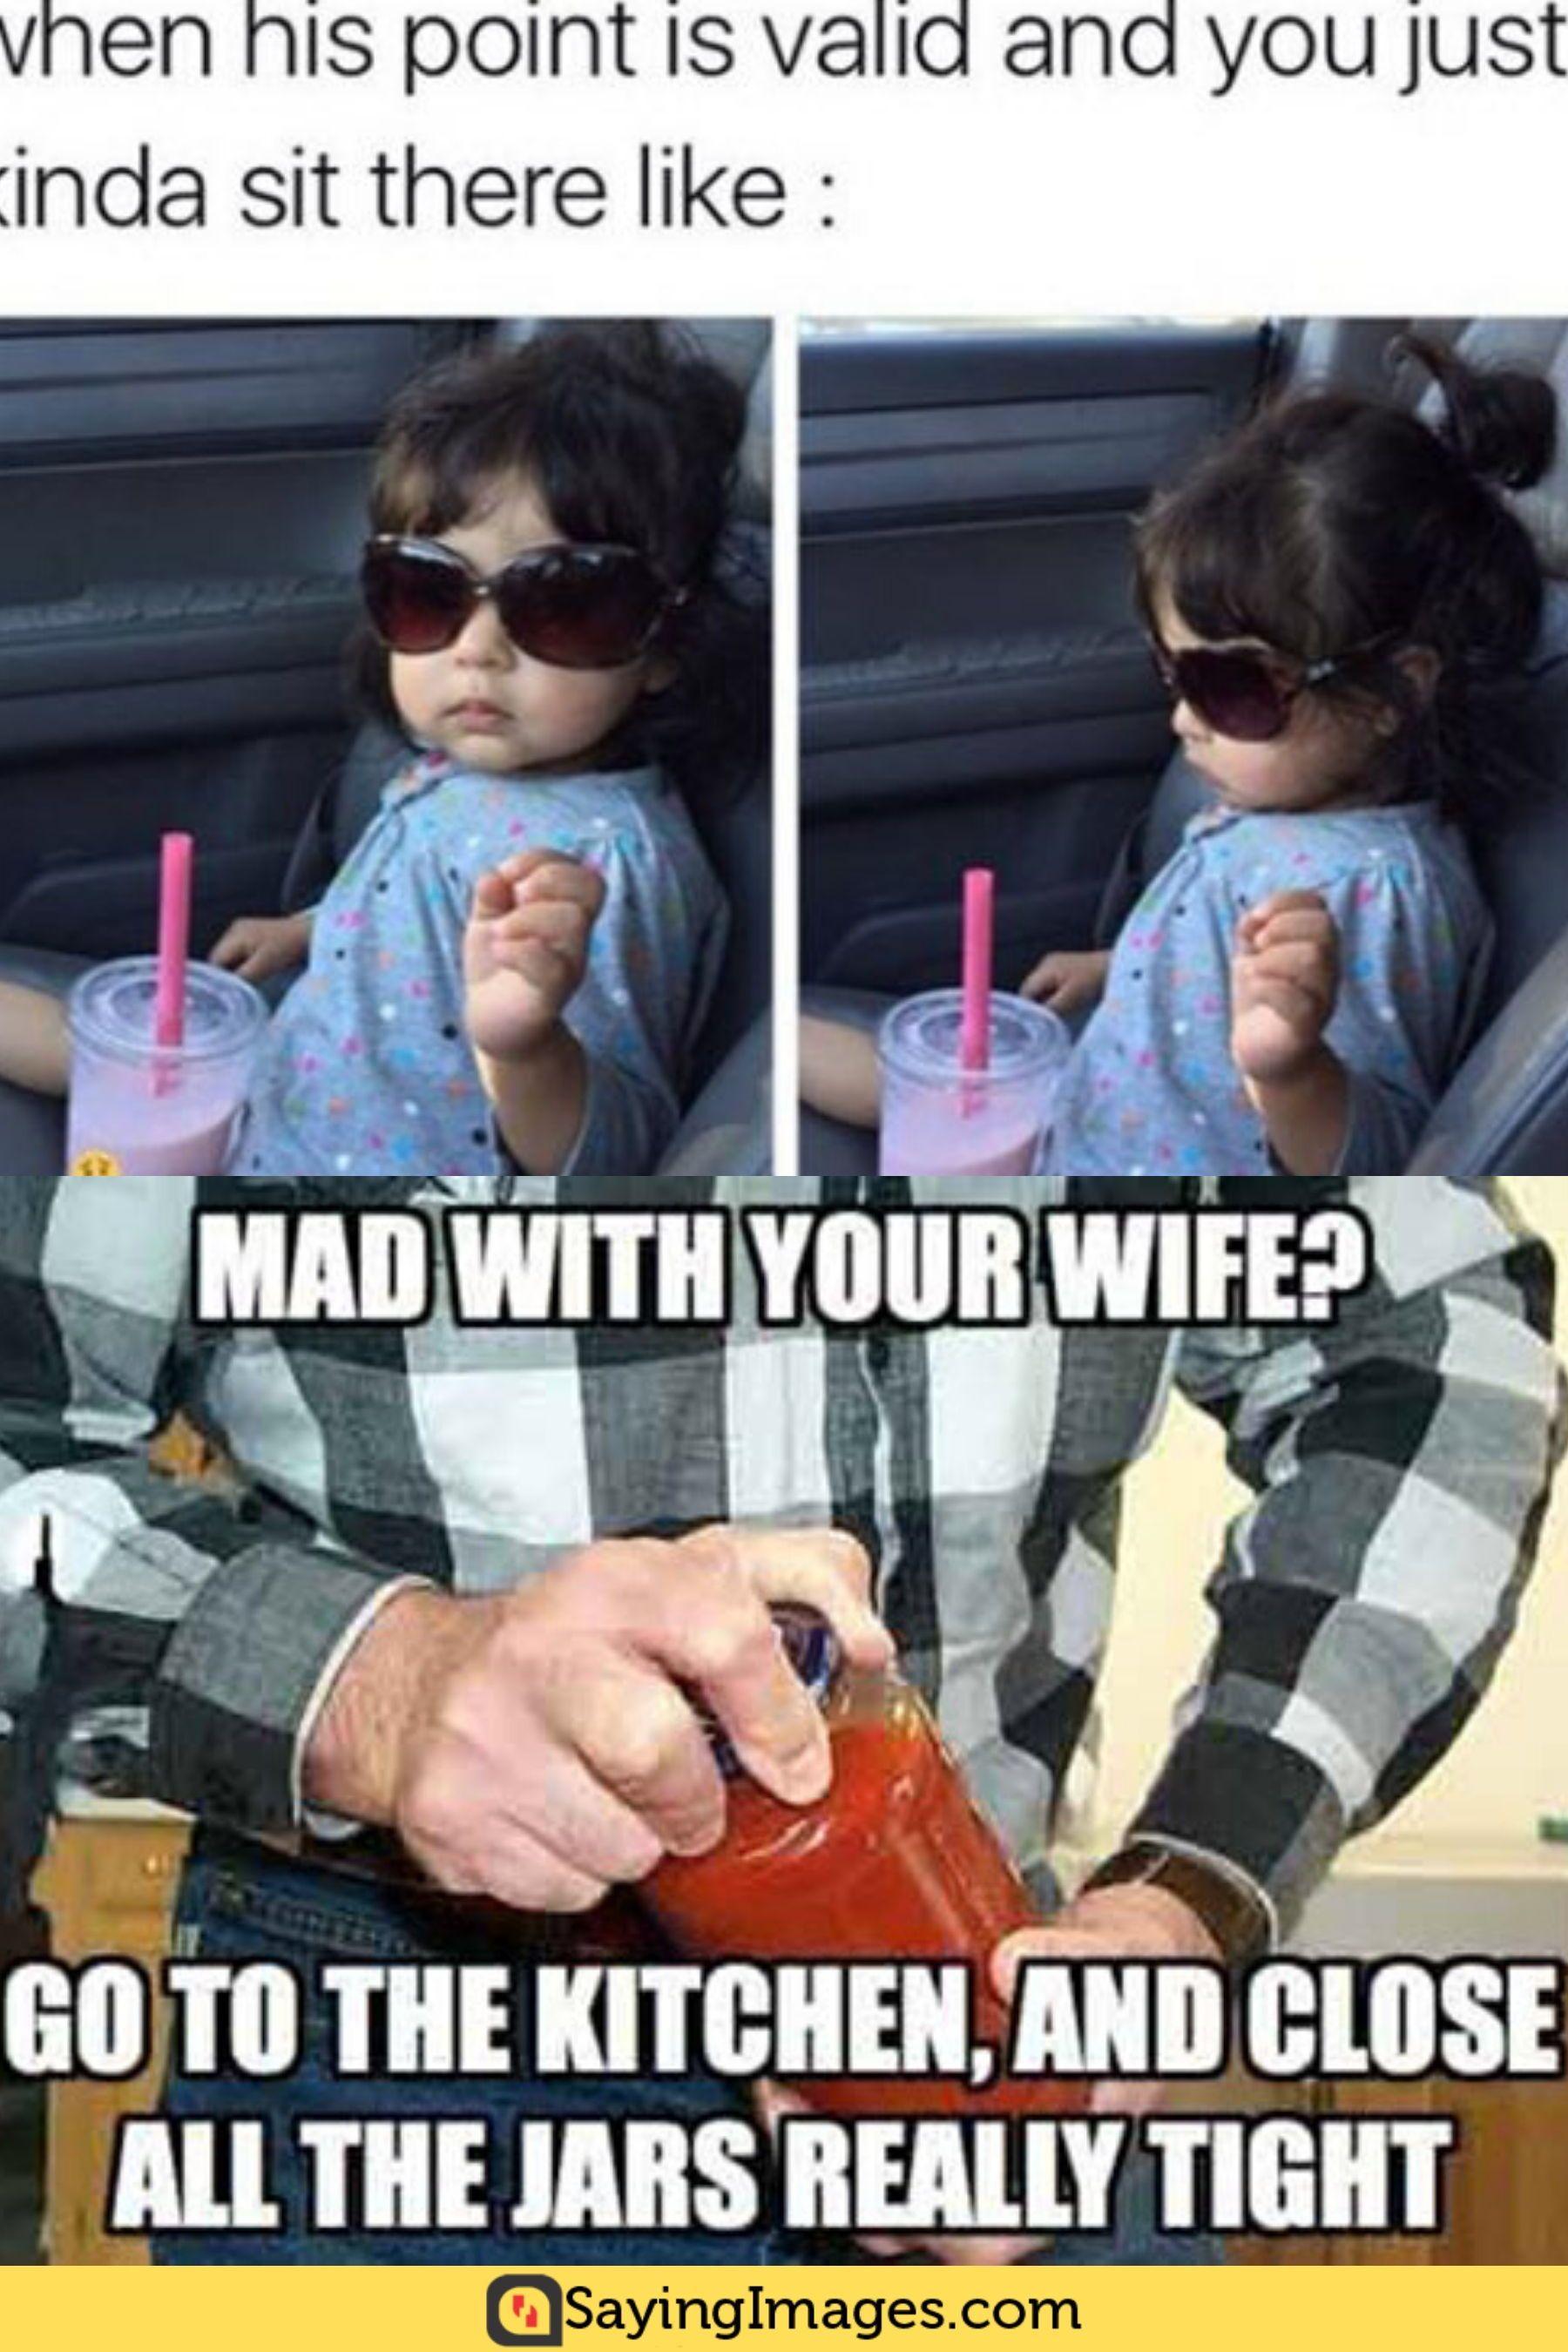 75 Funny Relationship Memes To Make Your Partner Laugh Sayingimages Com Funny Relationship Memes Relationship Memes Funny Relationship